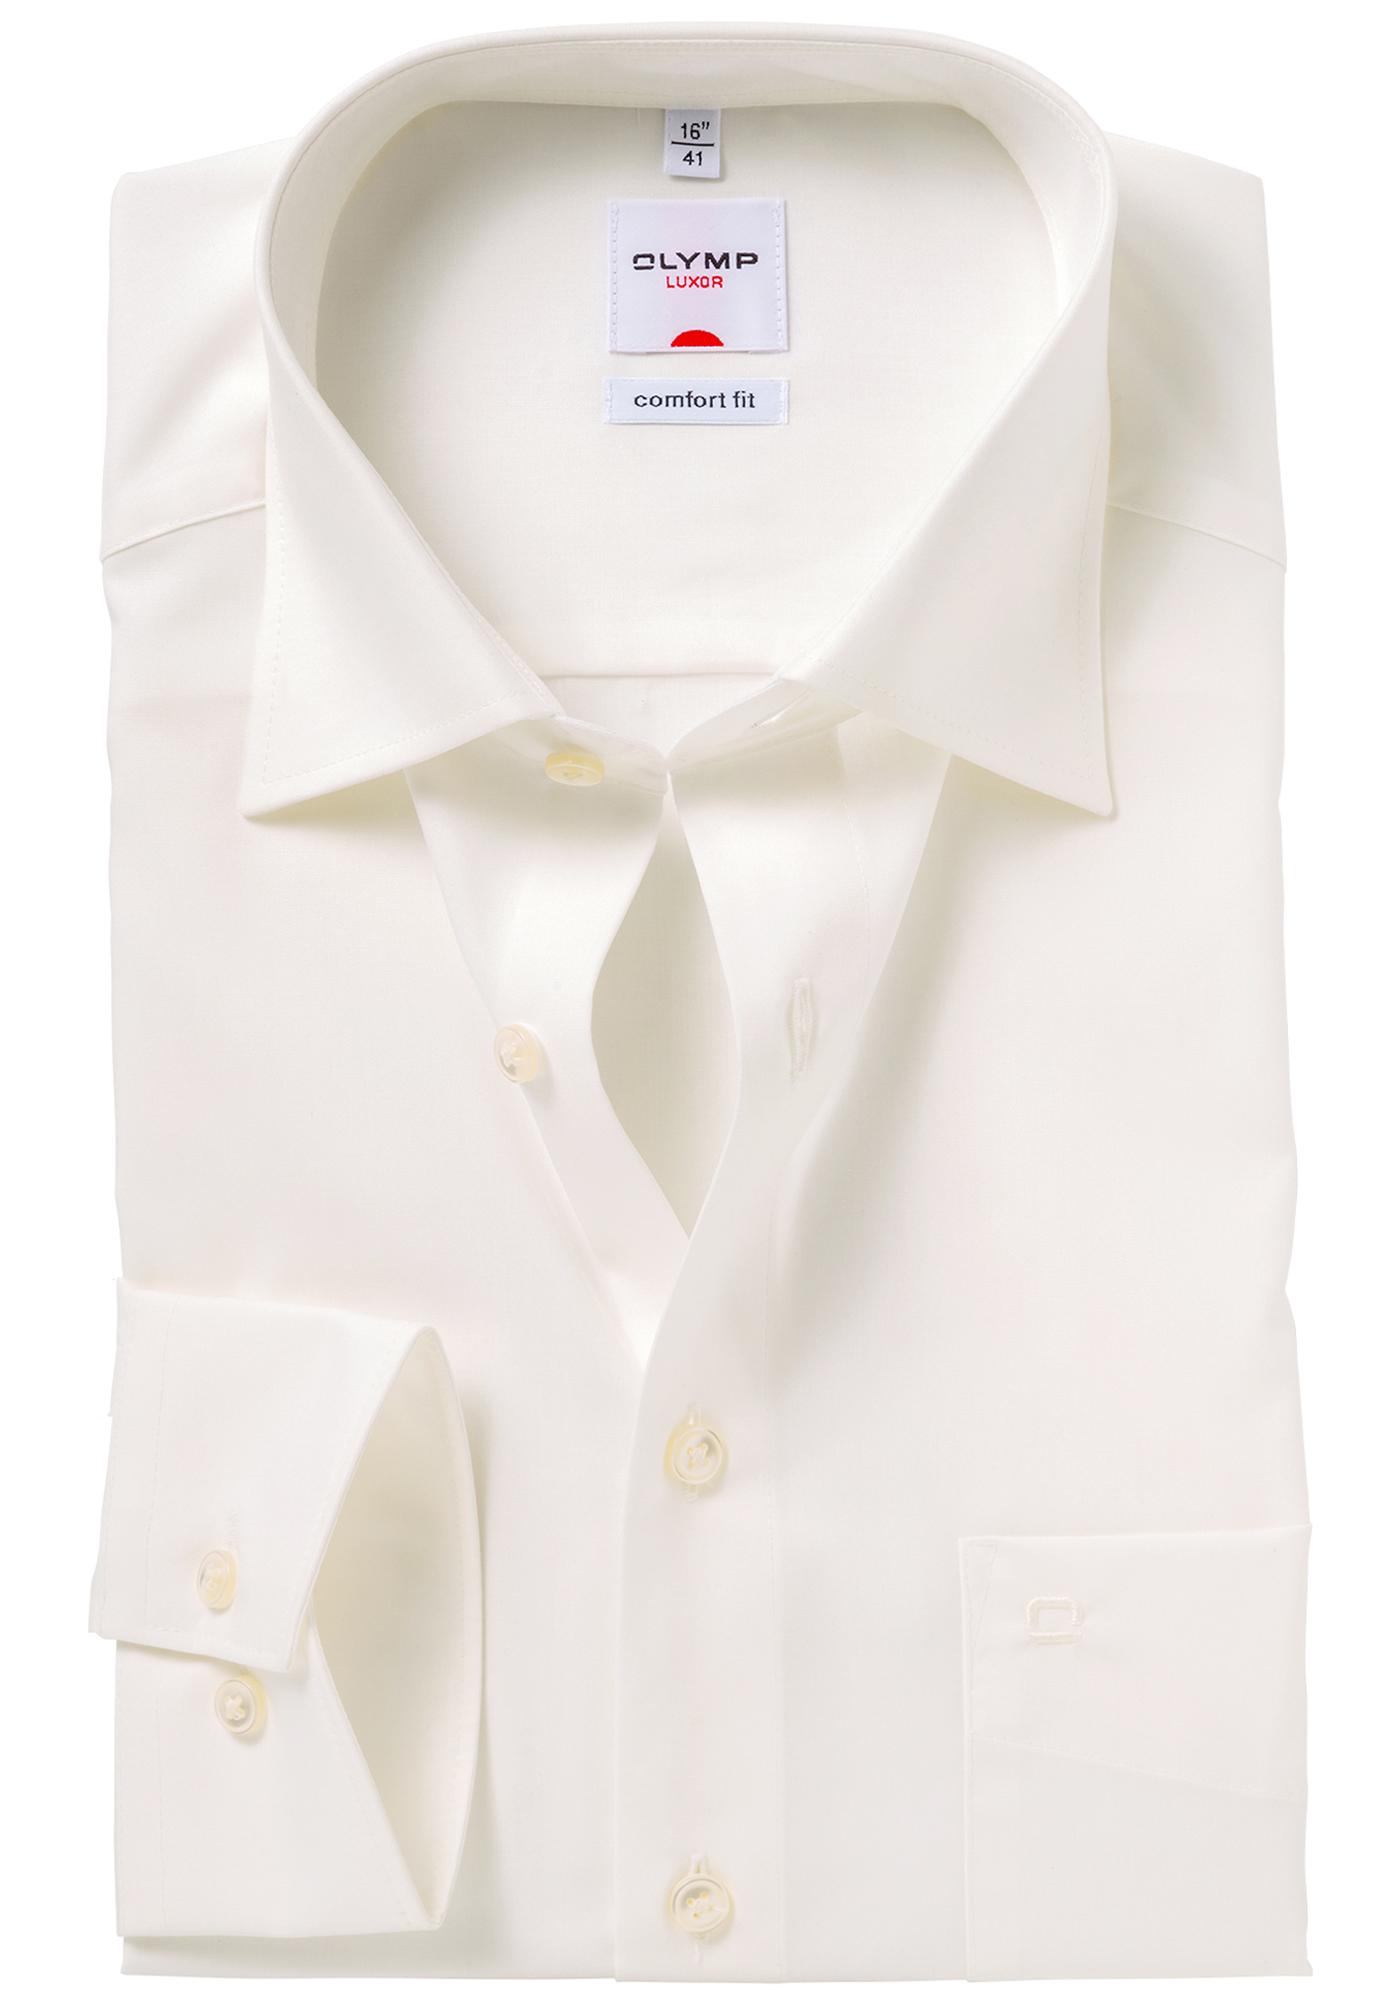 Overhemd Creme.Olymp Comfort Fit Overhemd Creme Gratis Bezorgd